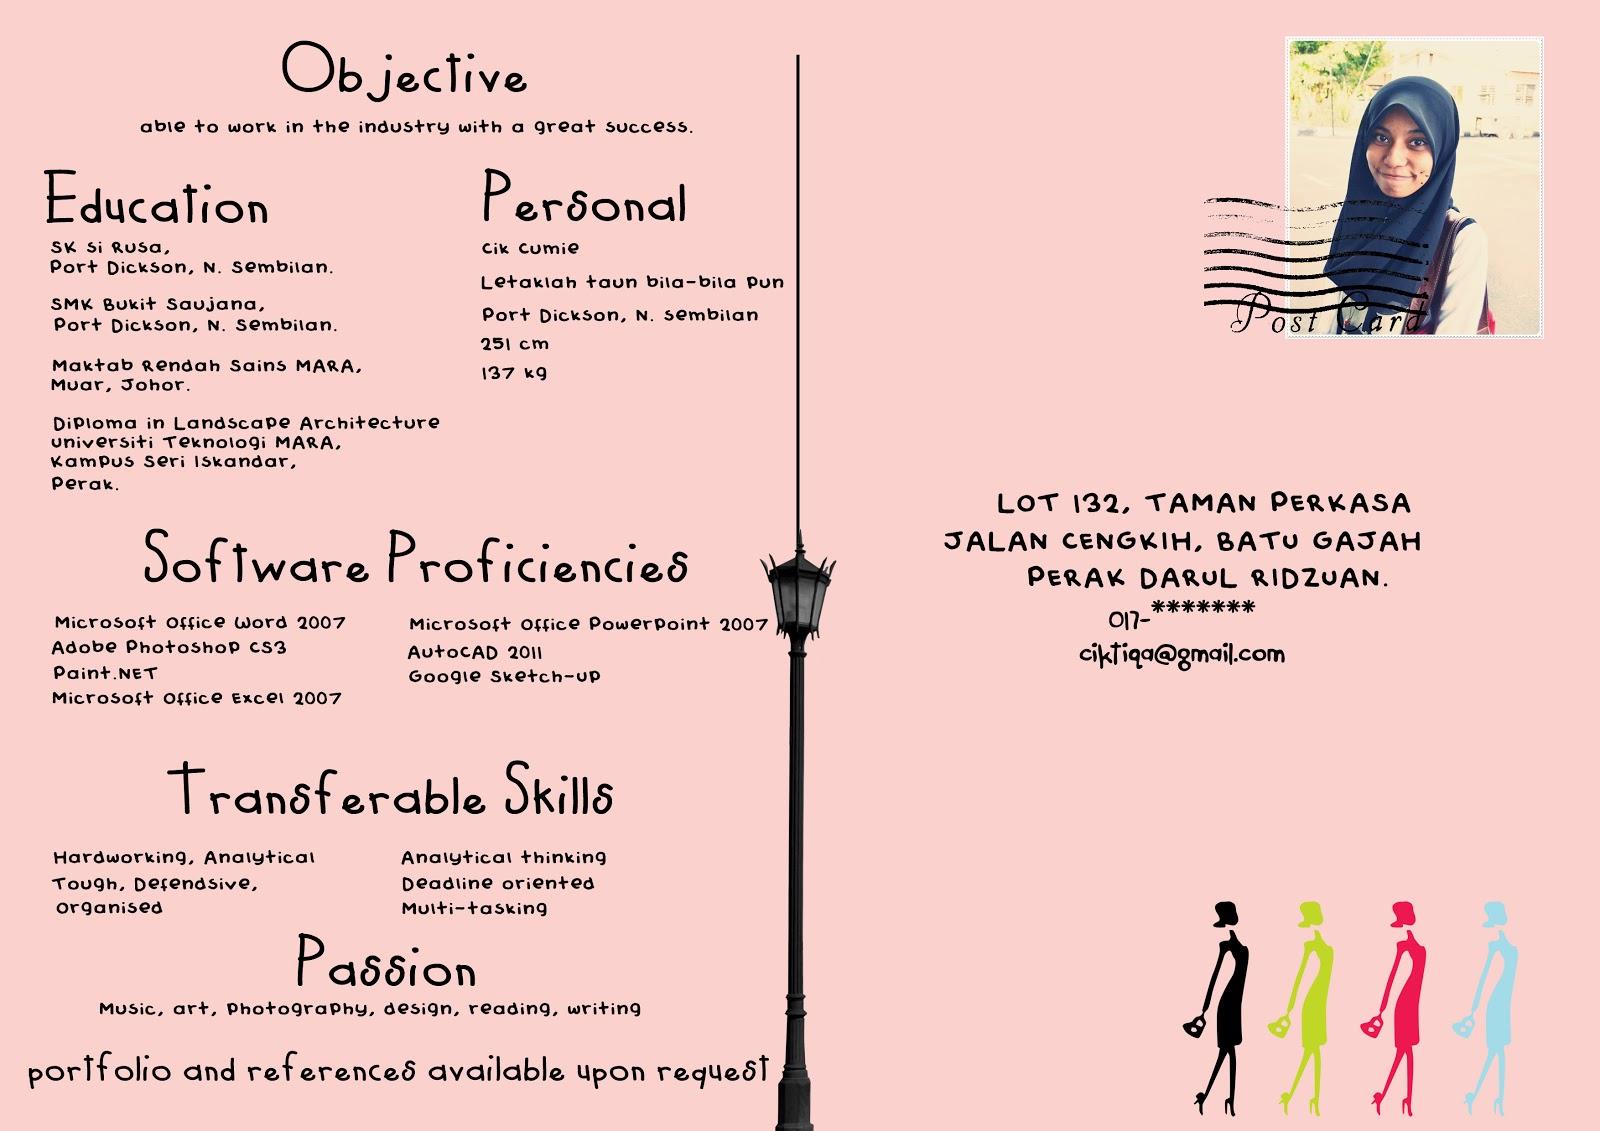 kb png contoh resume bahasa melayu resume kerja swasta resume kerja